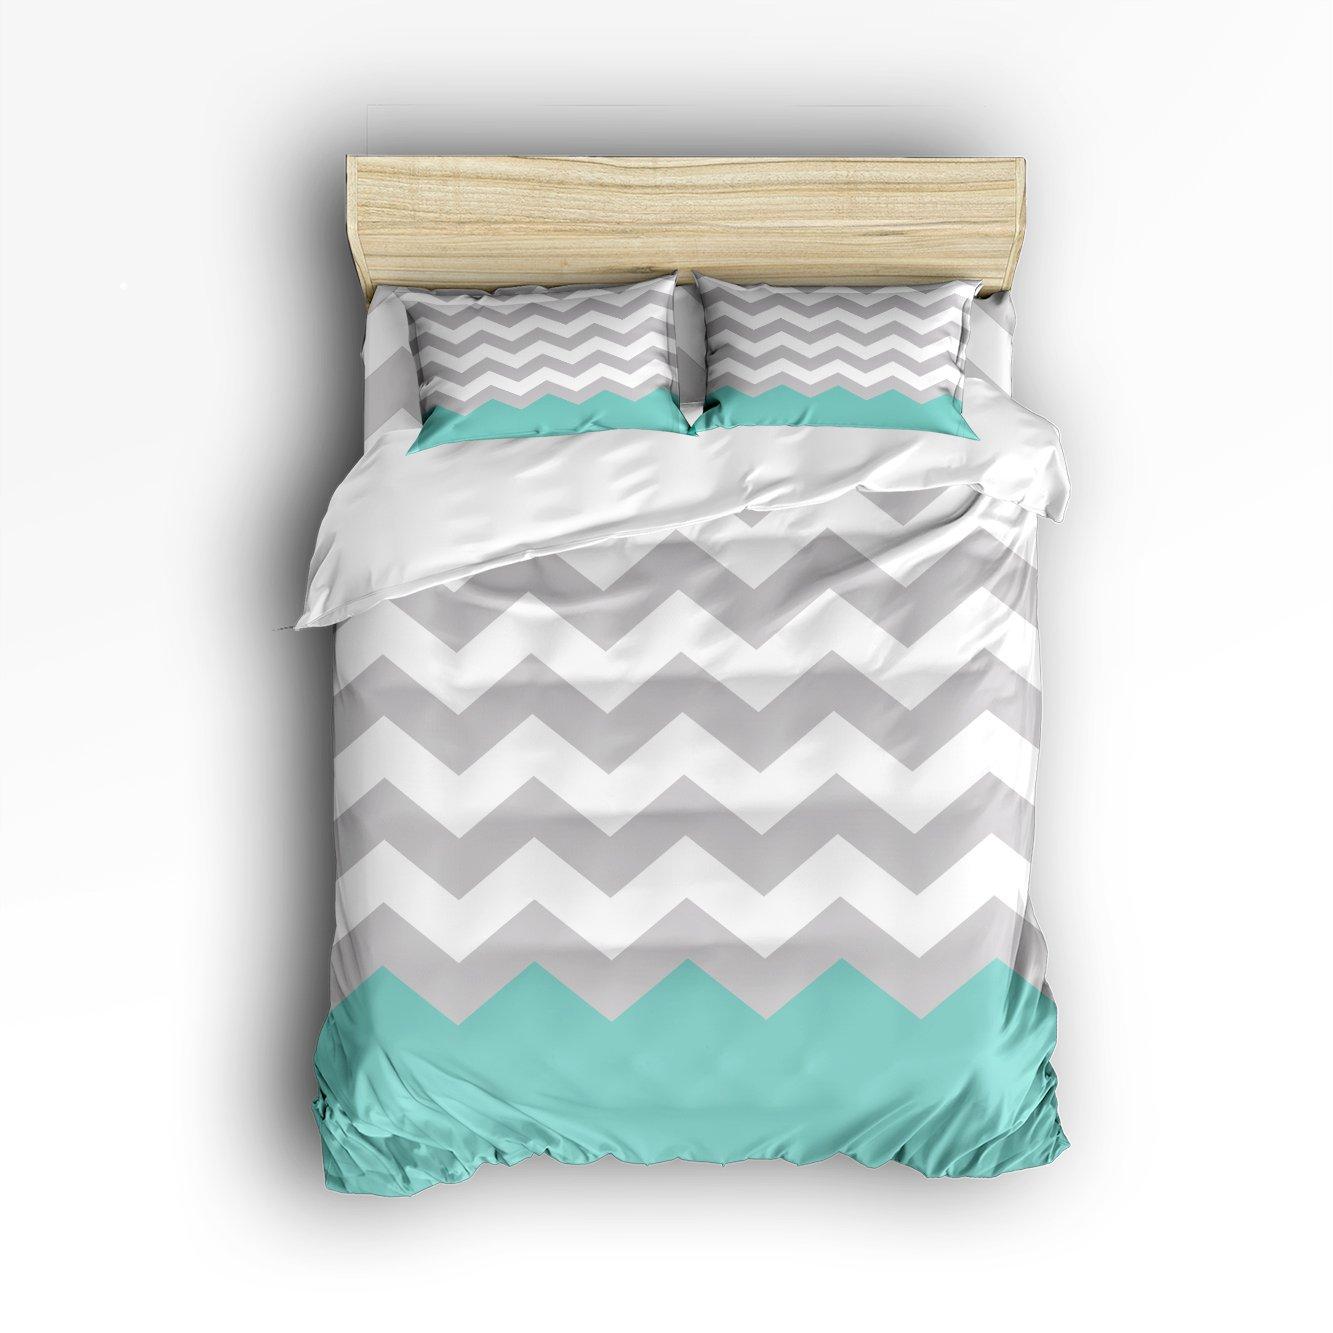 4Pieces Home Comforter Bedding Sets Duvet Cover Sets Bedspread for Adult Kids,Flat Sheet,Shams Set,Blue Gray White Chevron Zigzag Pattern Full Size